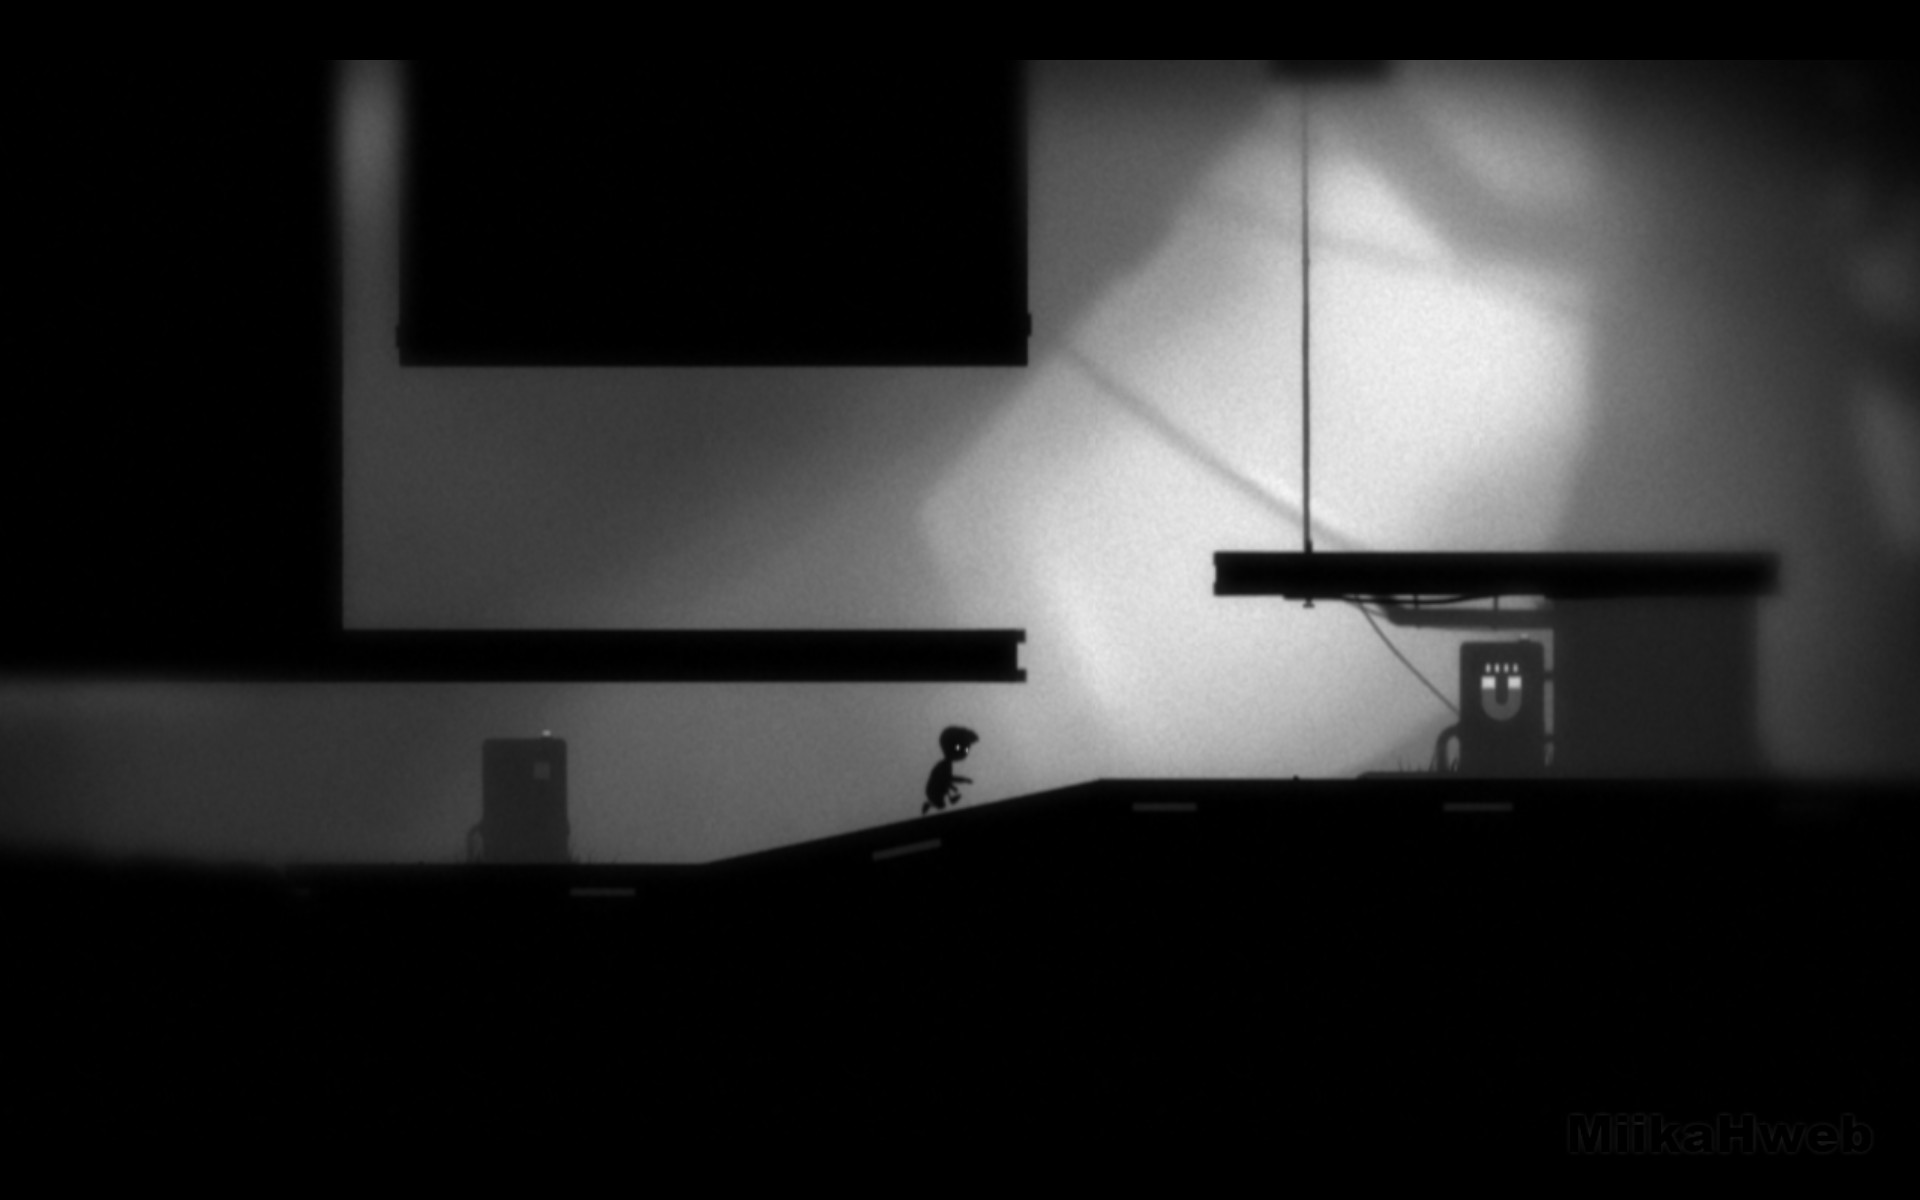 Limbo free online